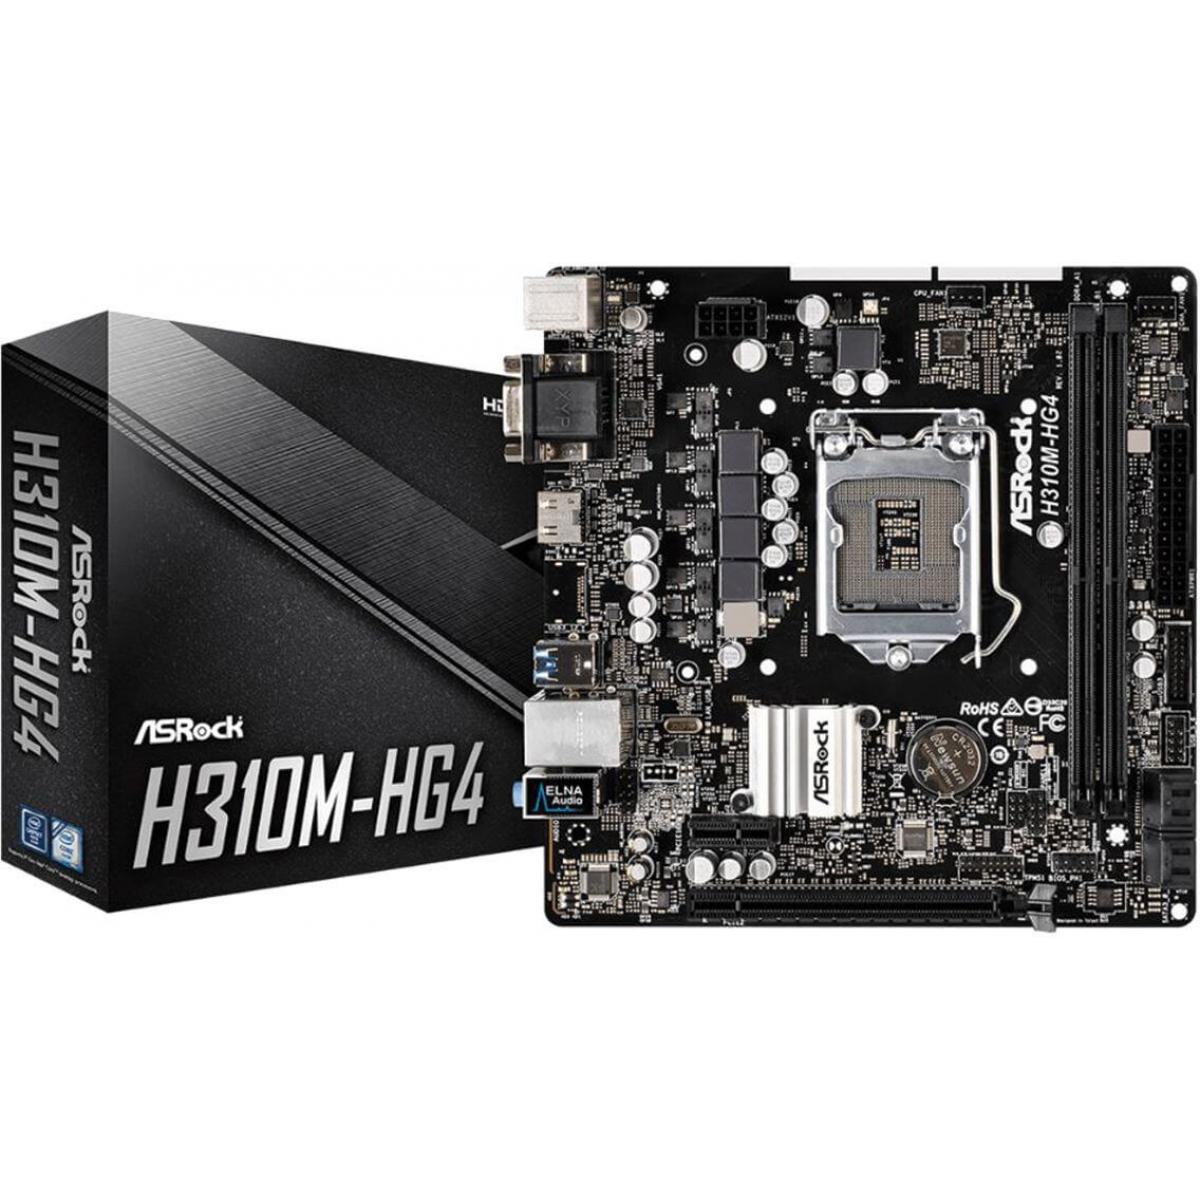 Placa Mãe ASRock H310M-HG4, Chipset H310, Intel LGA 1151, mATX, DDR4